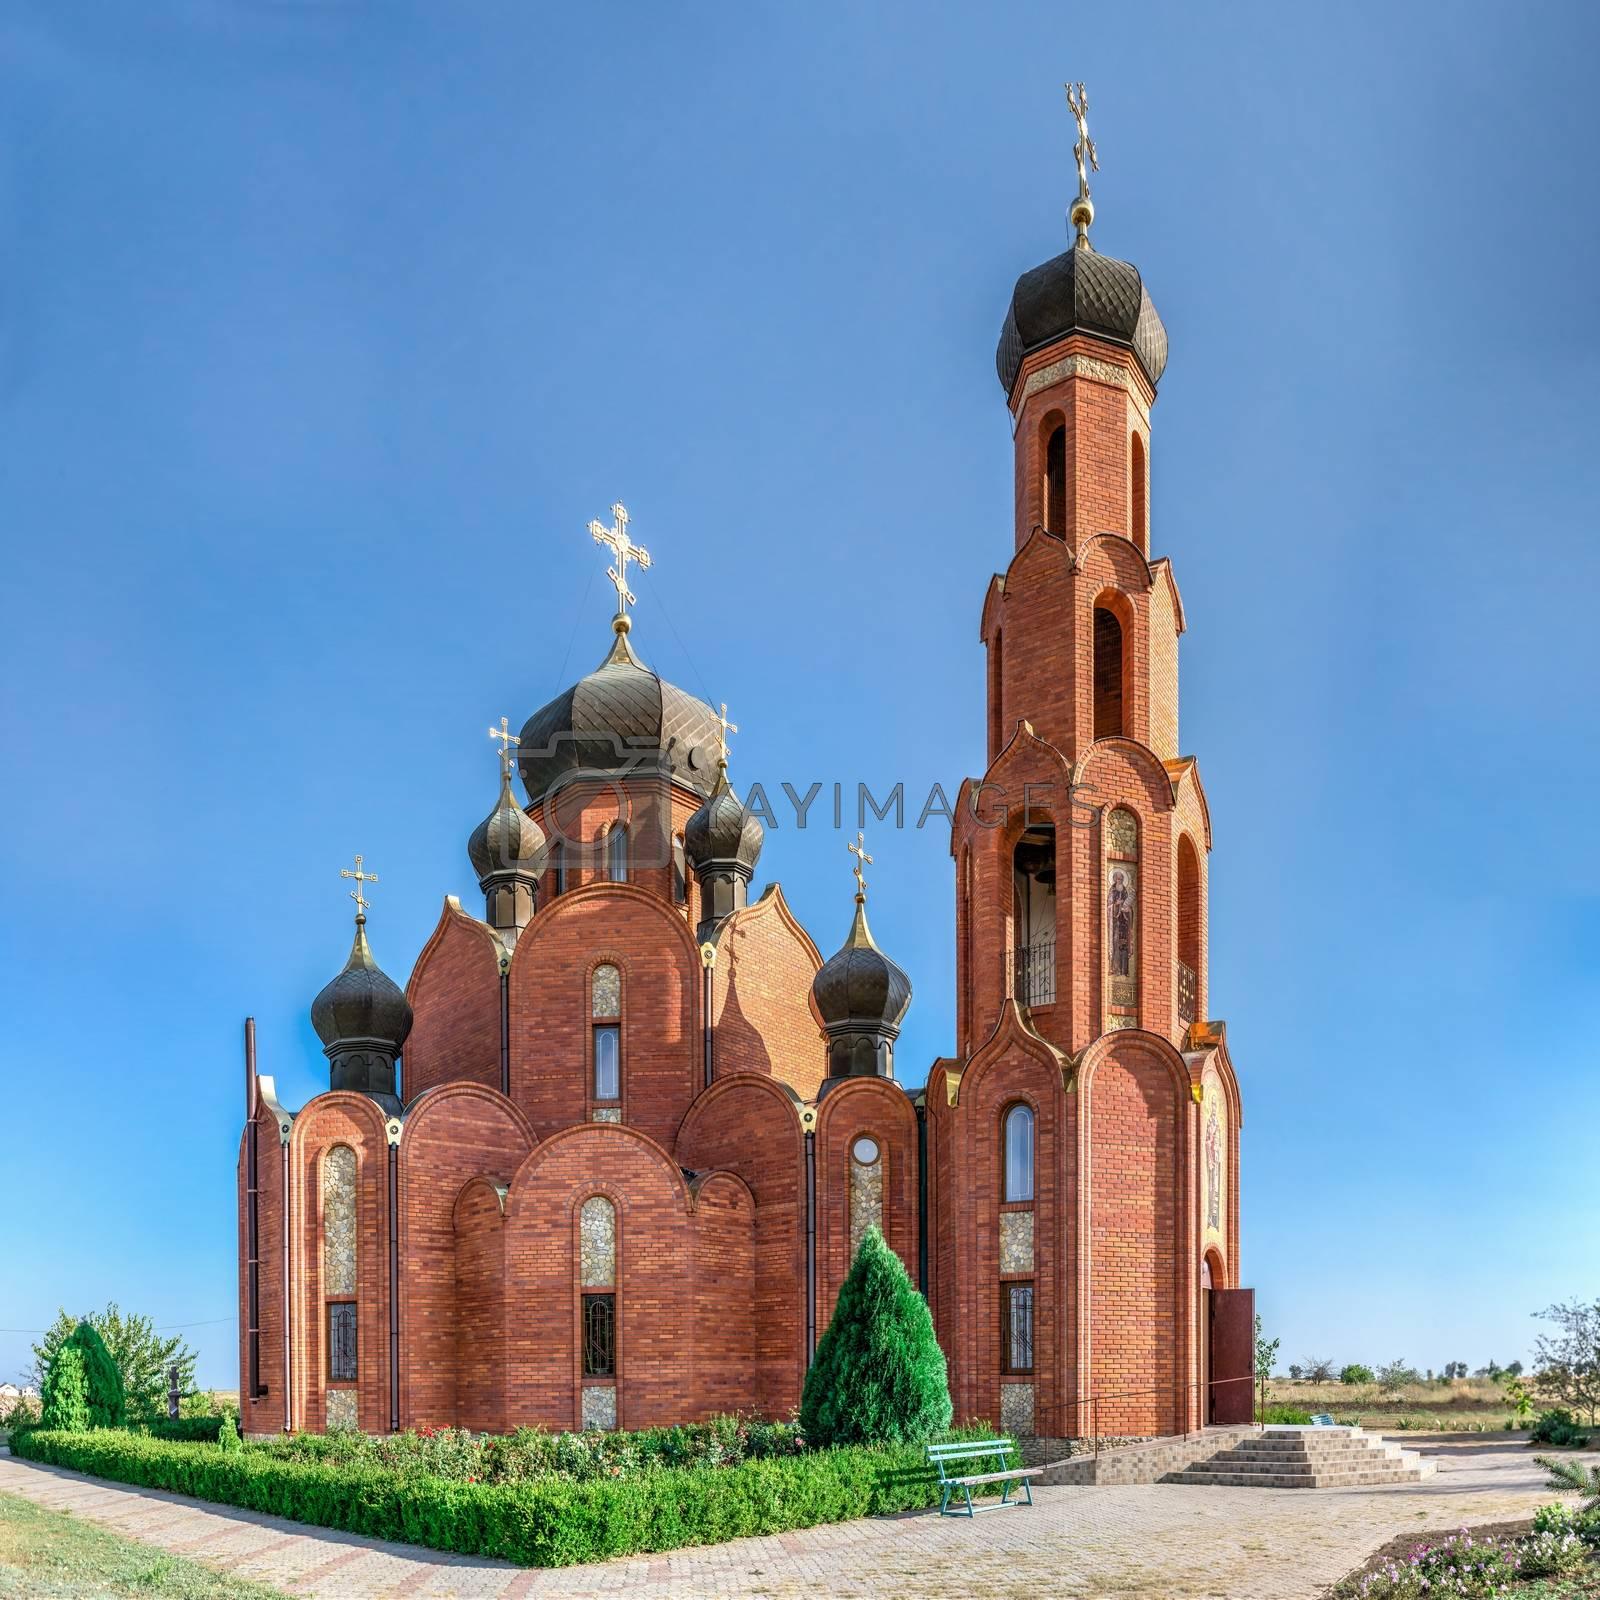 Church of St. Nicholas in Rybakovka, Odessa region, Ukraine, on a sunny summer day